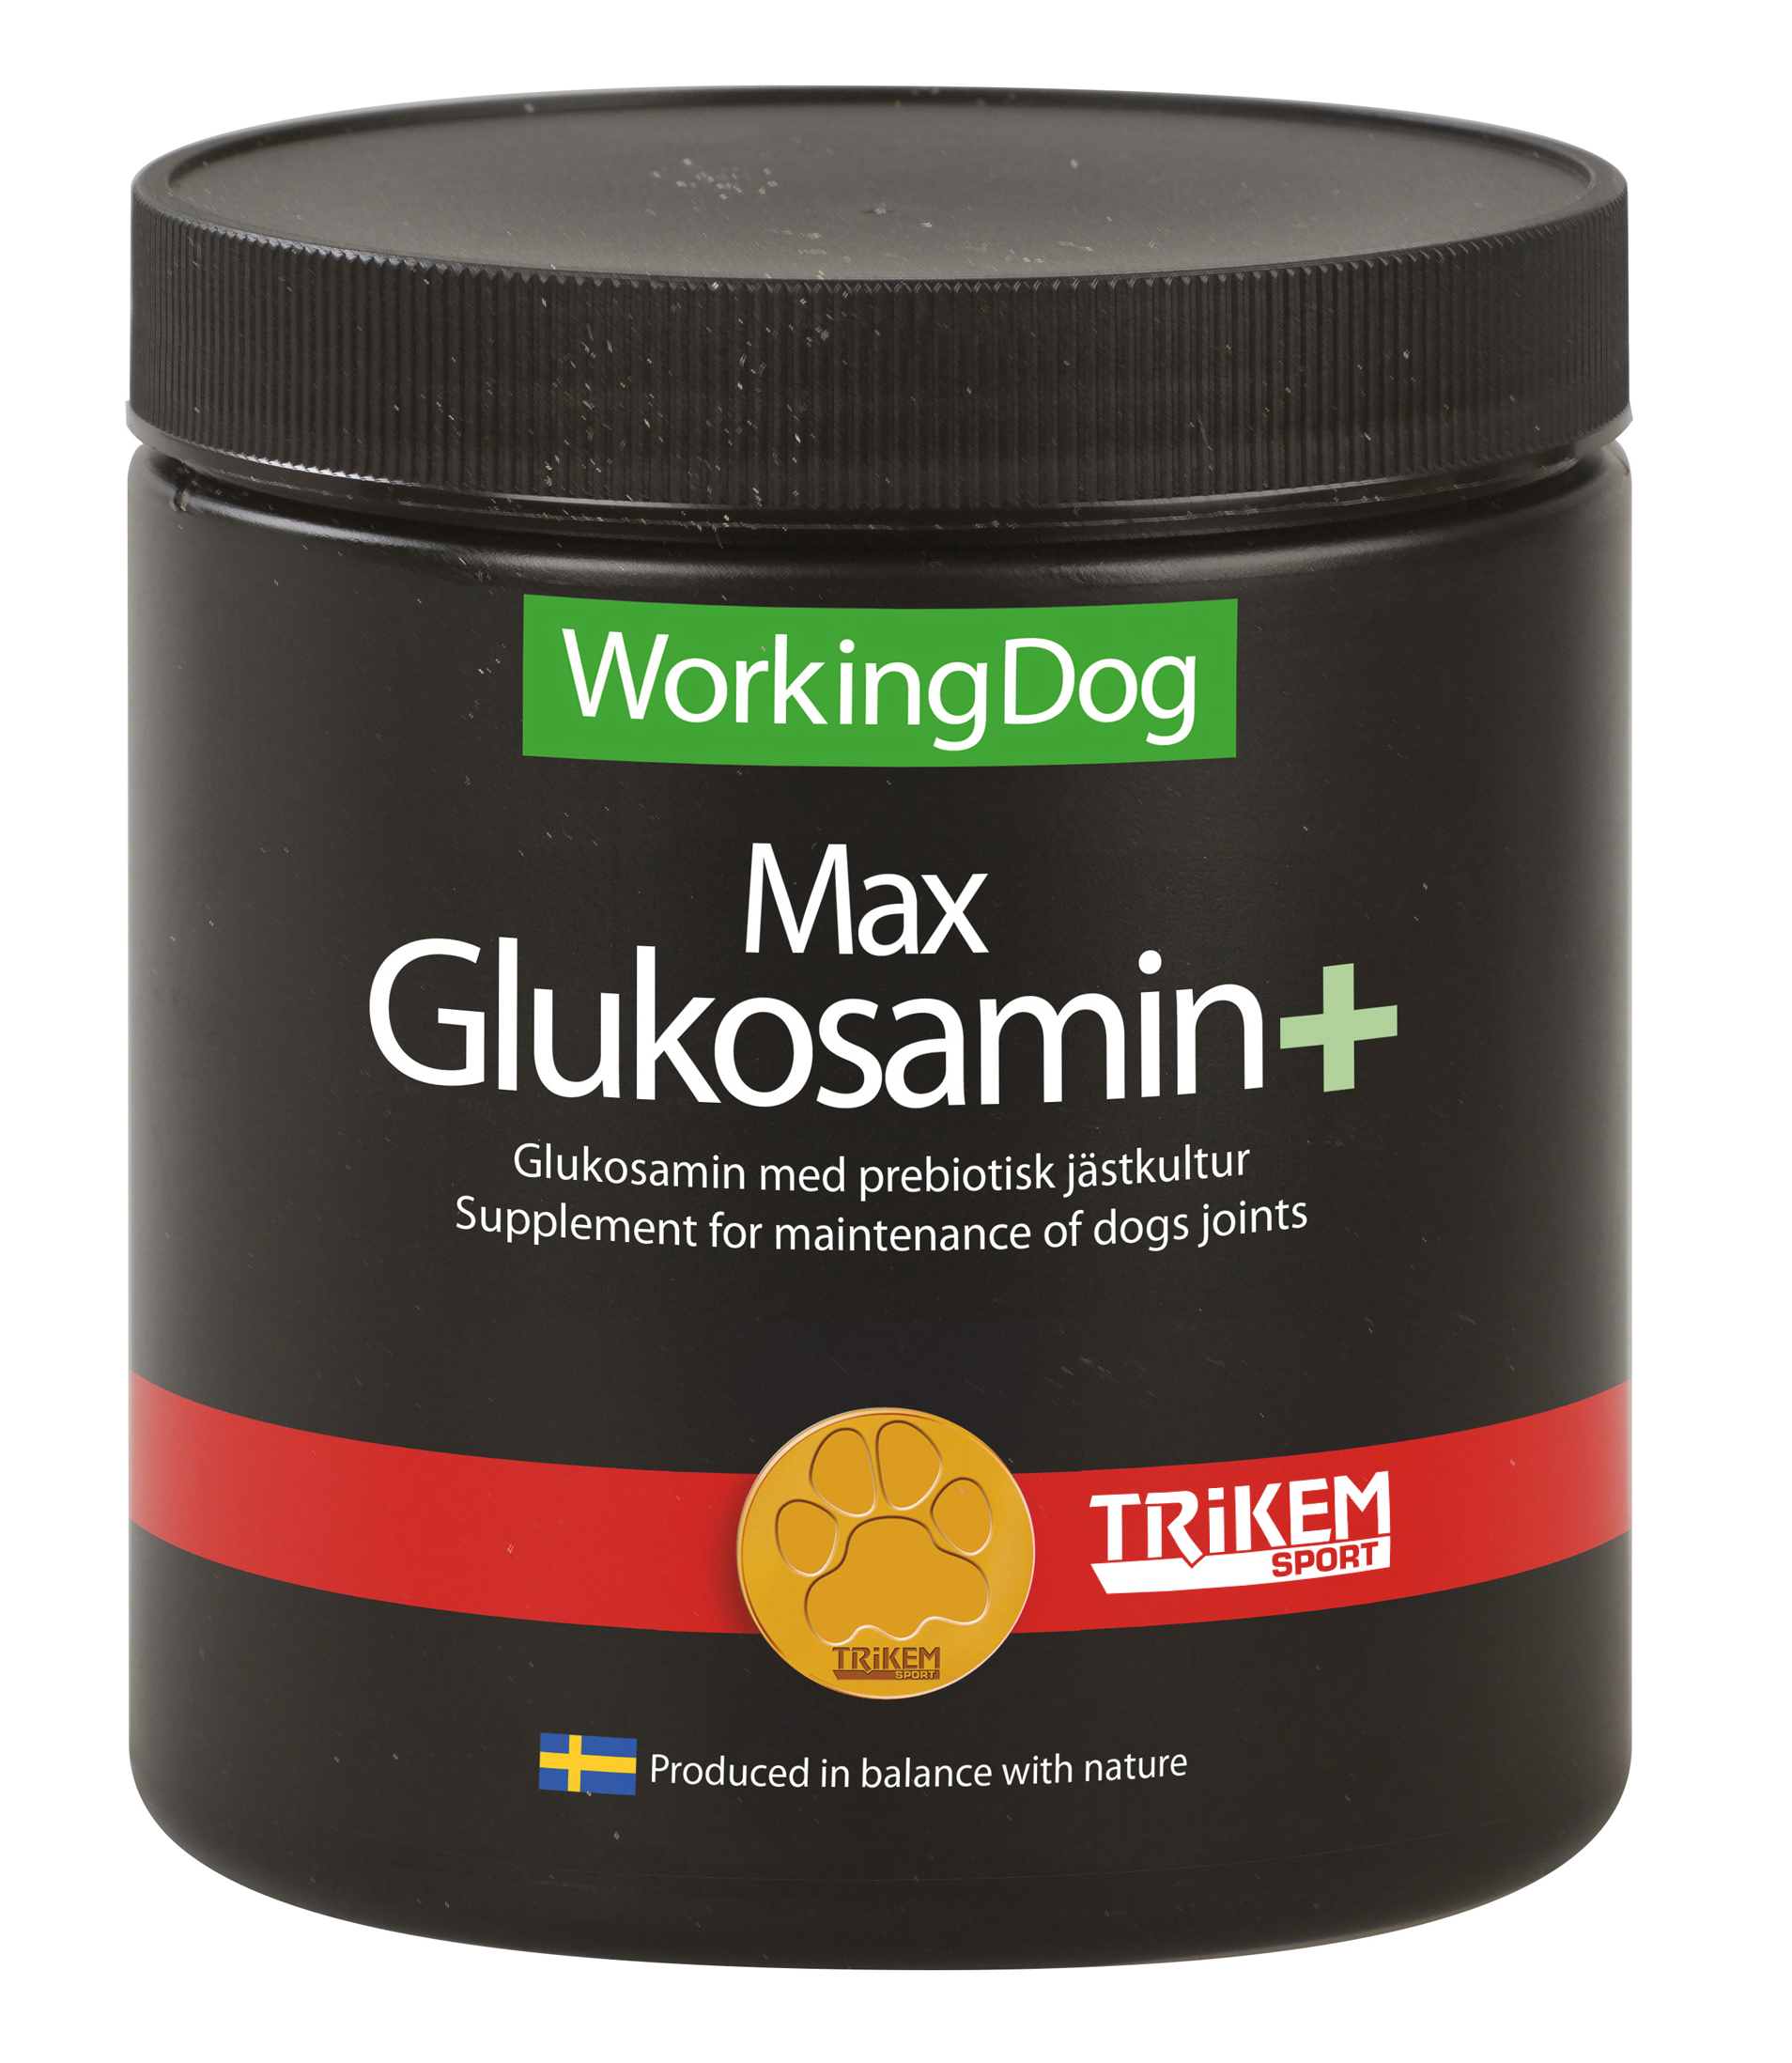 Trikem Max Glukosamin hund